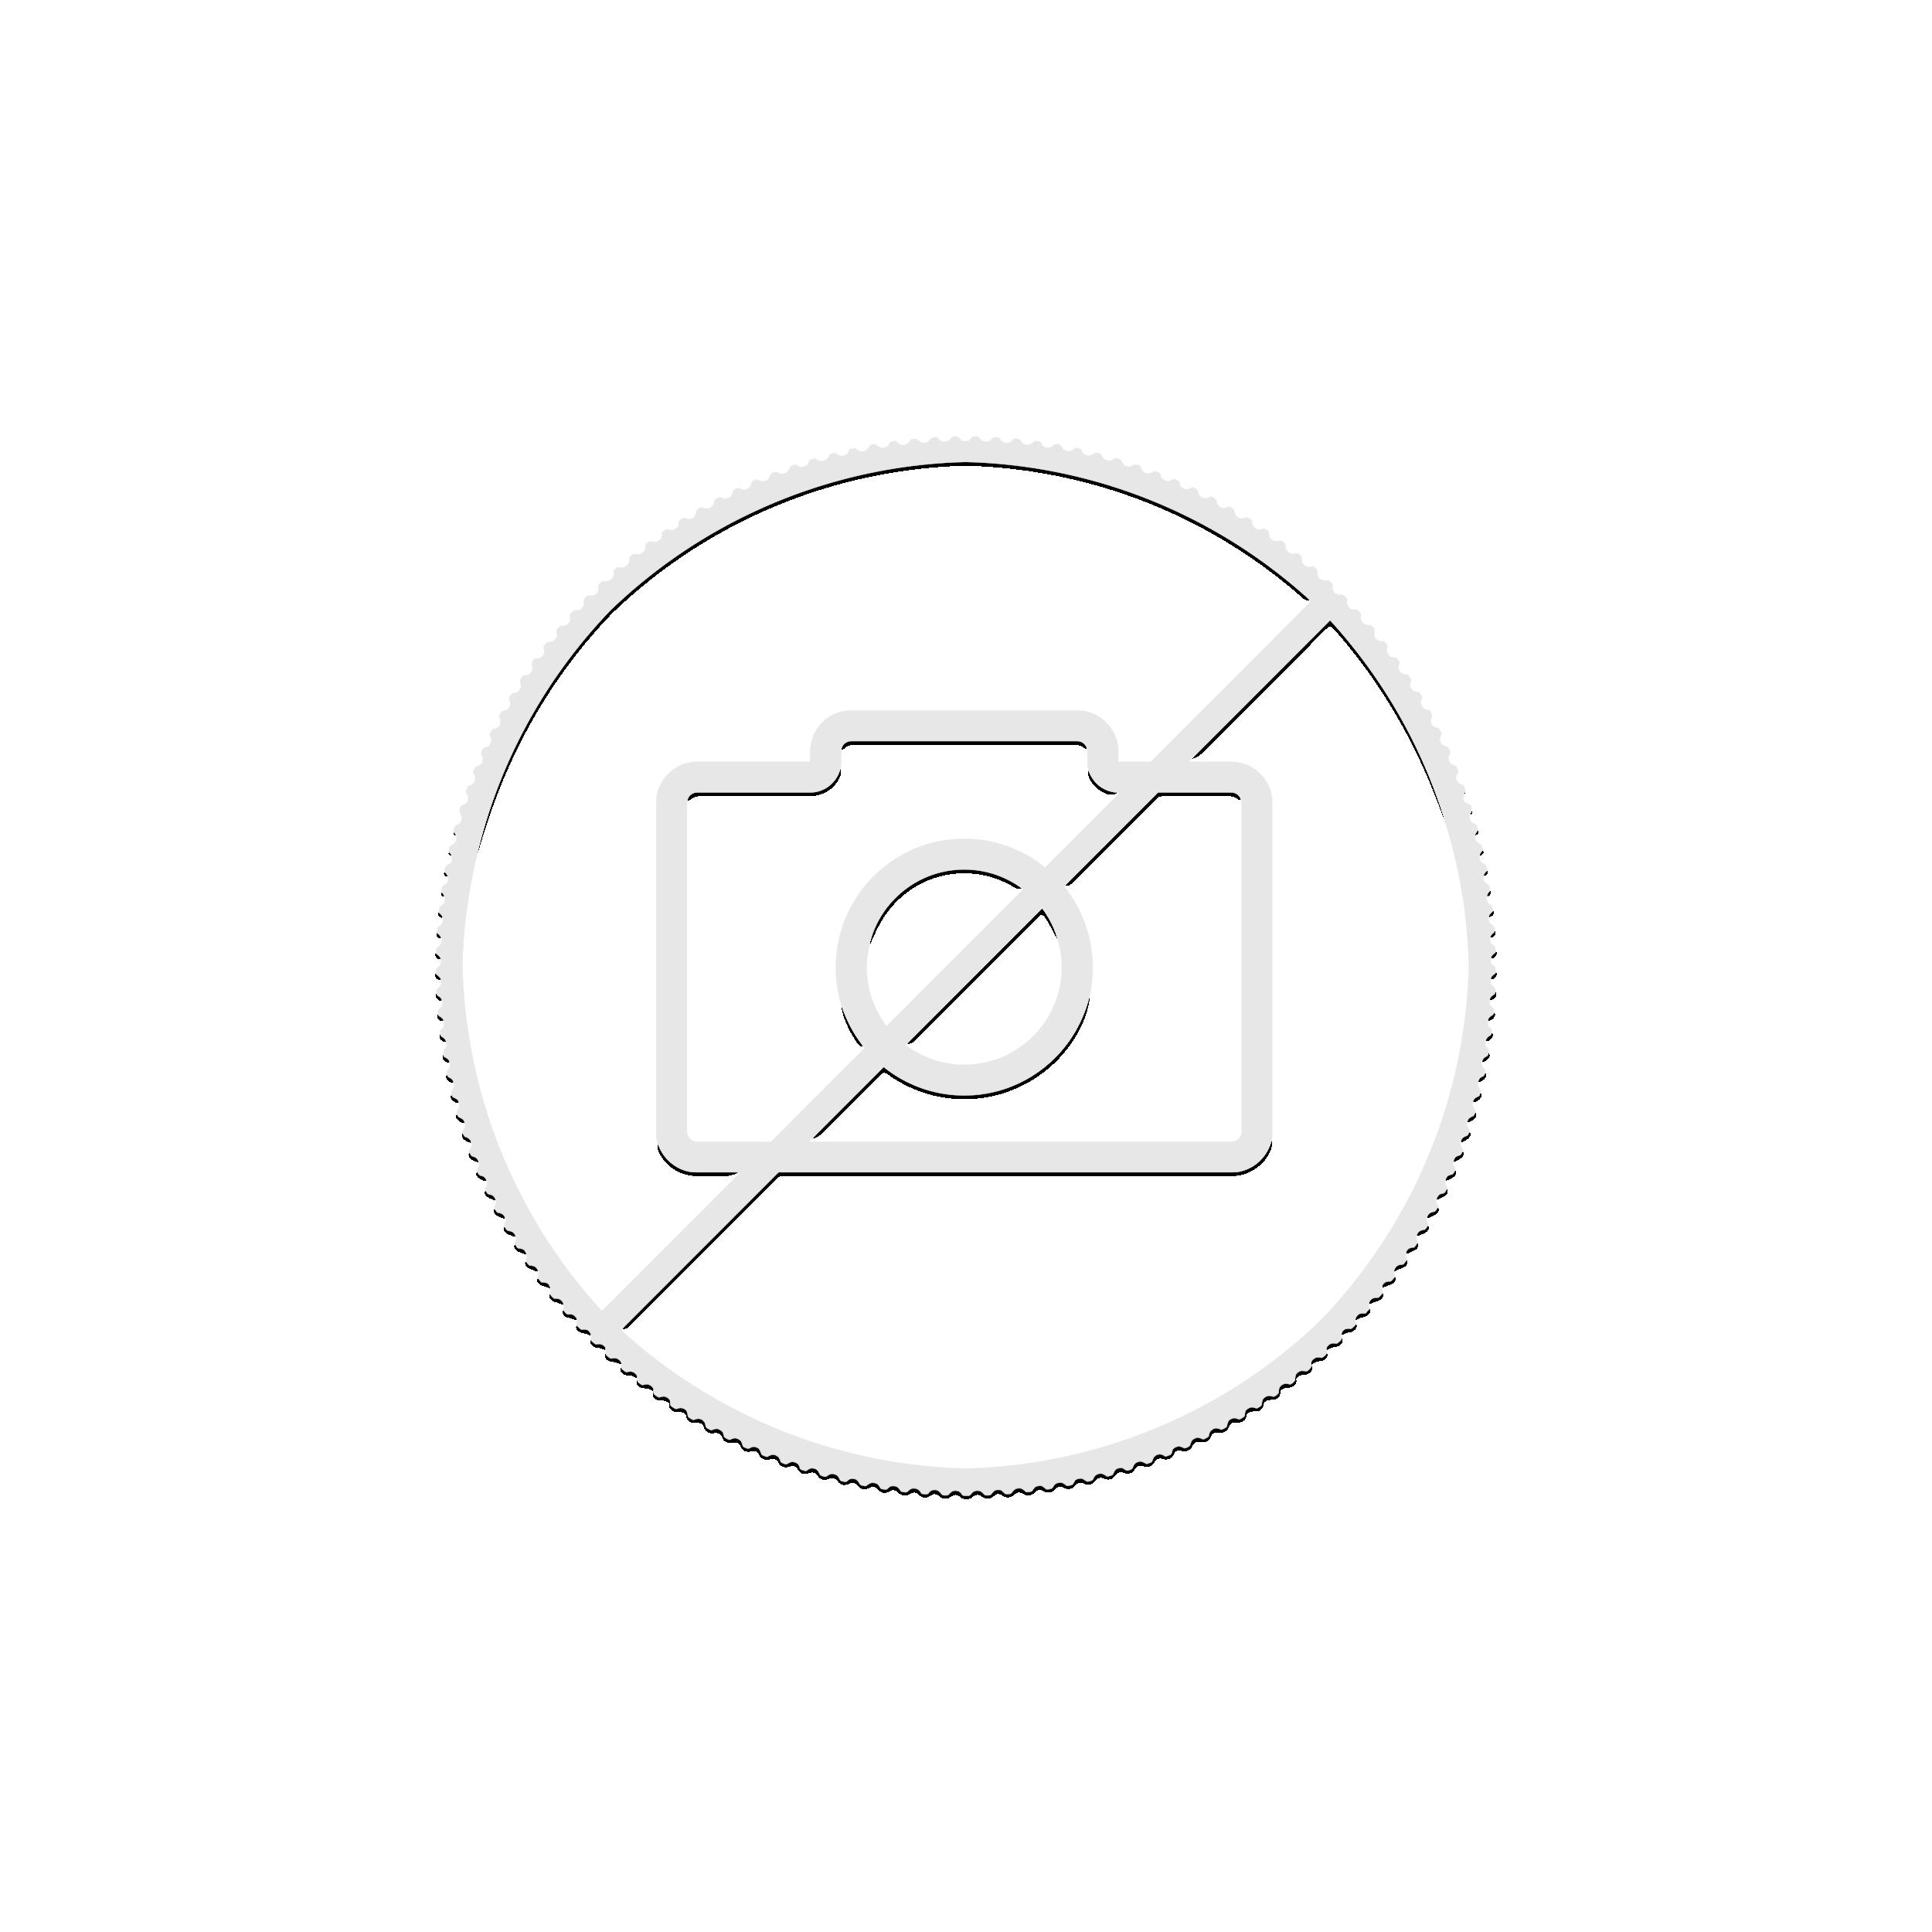 1 troy ounce zilveren Maple Leaf 2017 Voyageur